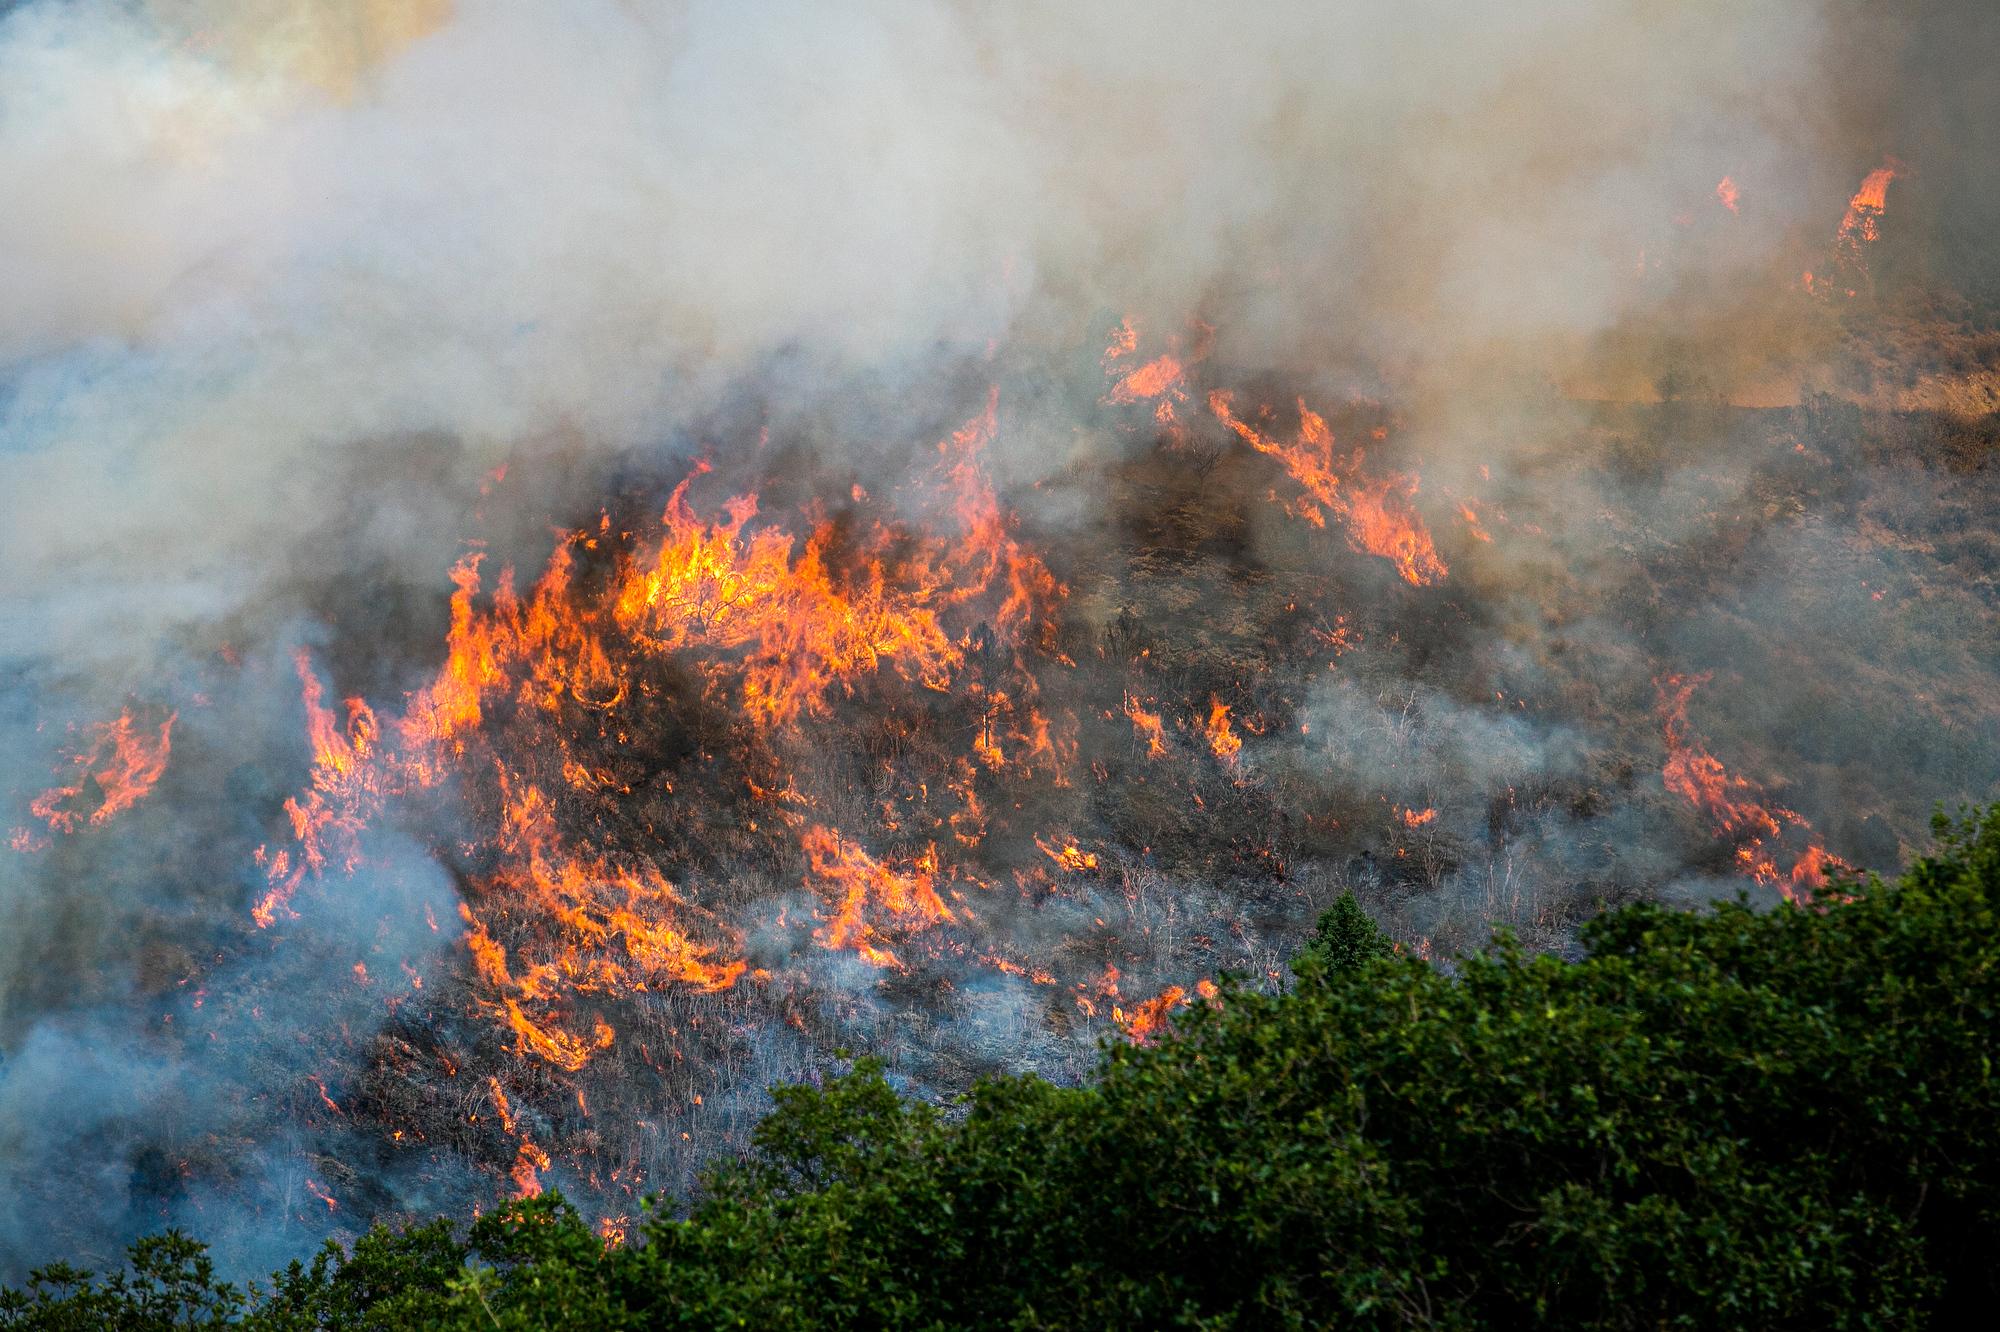 WILDFIRE-RECAP-GRIZZLY-CREEK-GLENWOOD-CANYON